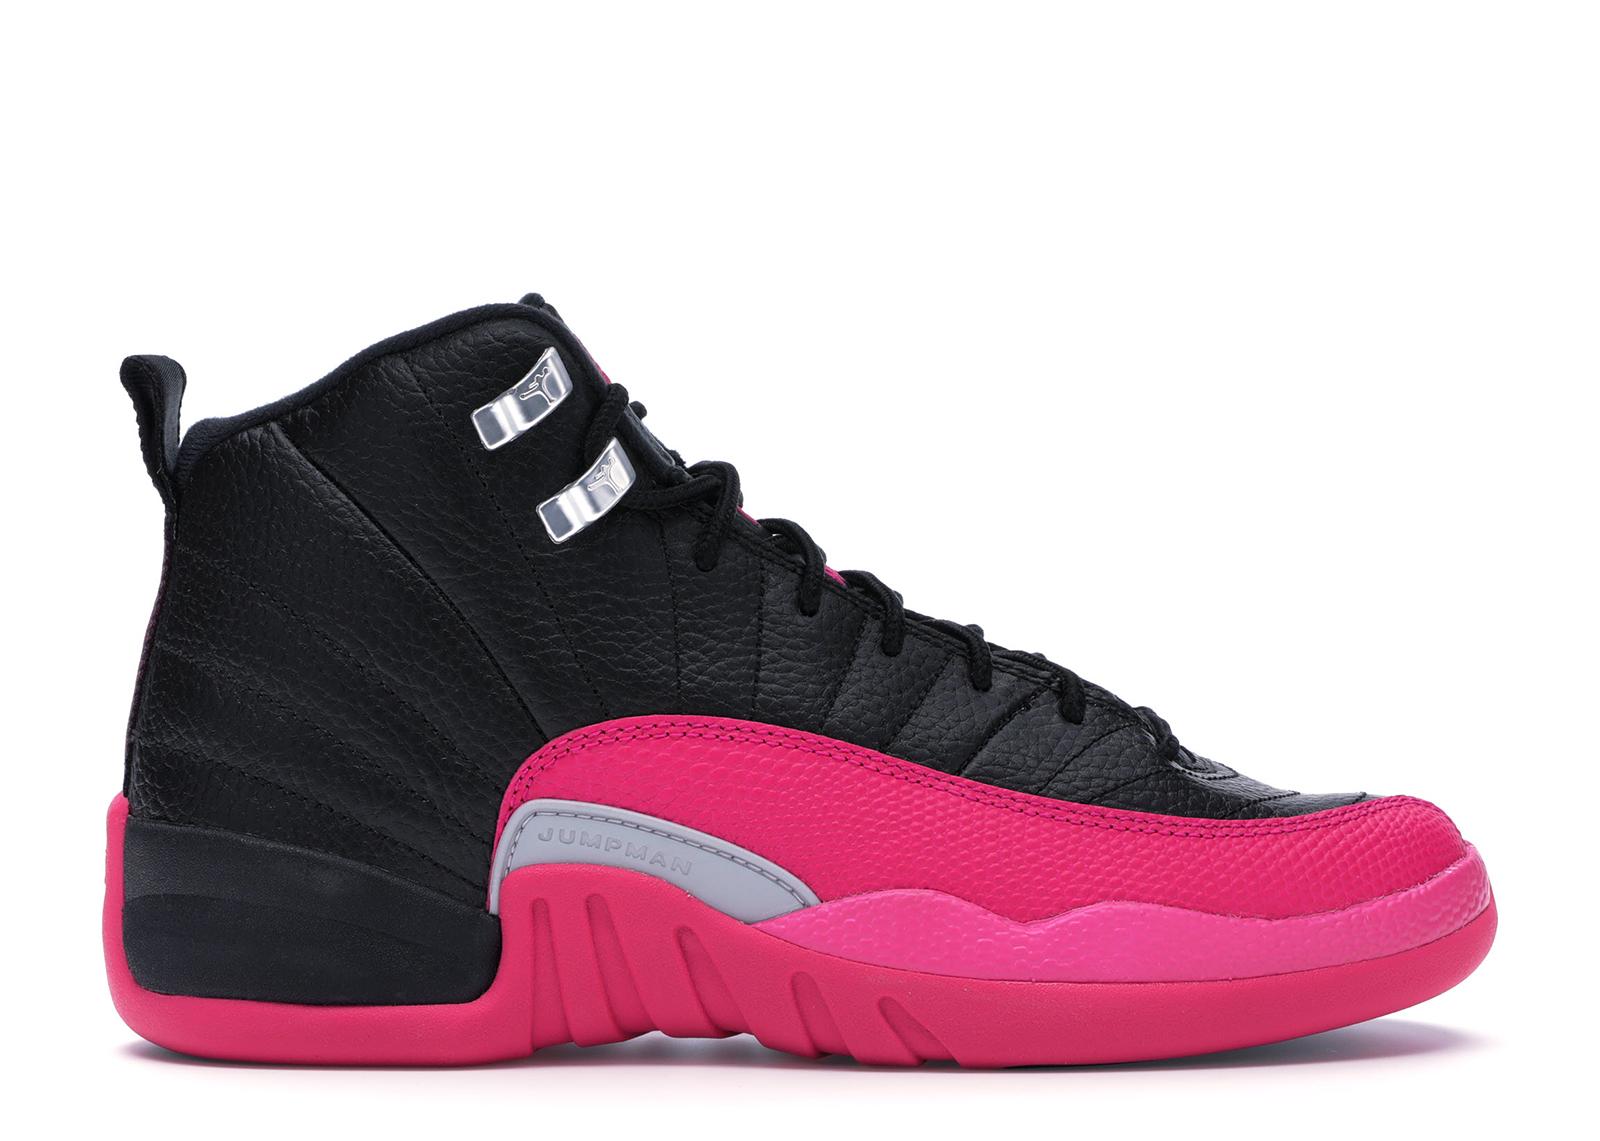 Jordan 12 Retro Black Deadly Pink (GS)